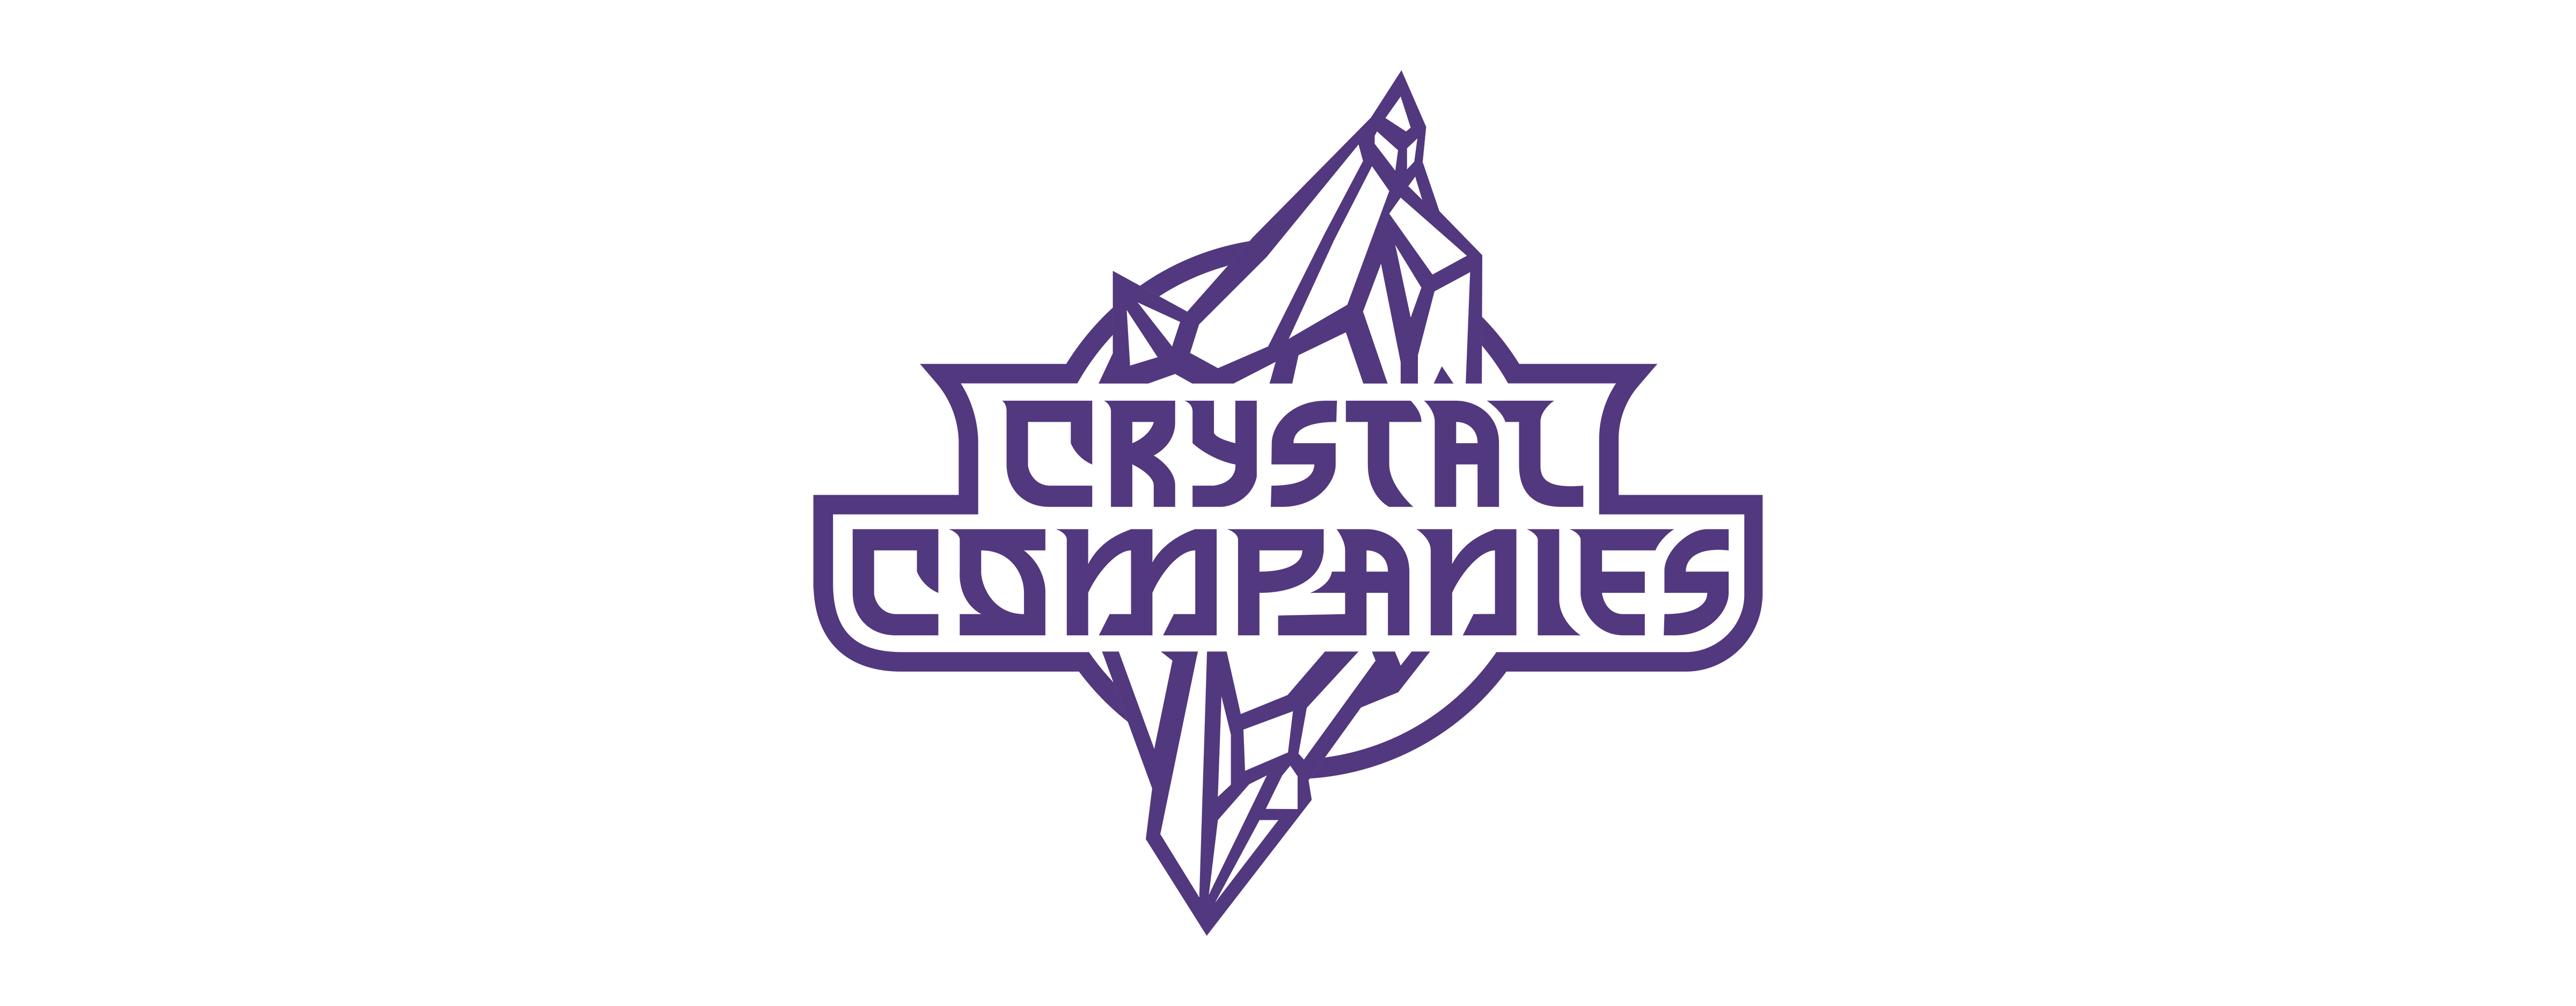 Crystal Companies